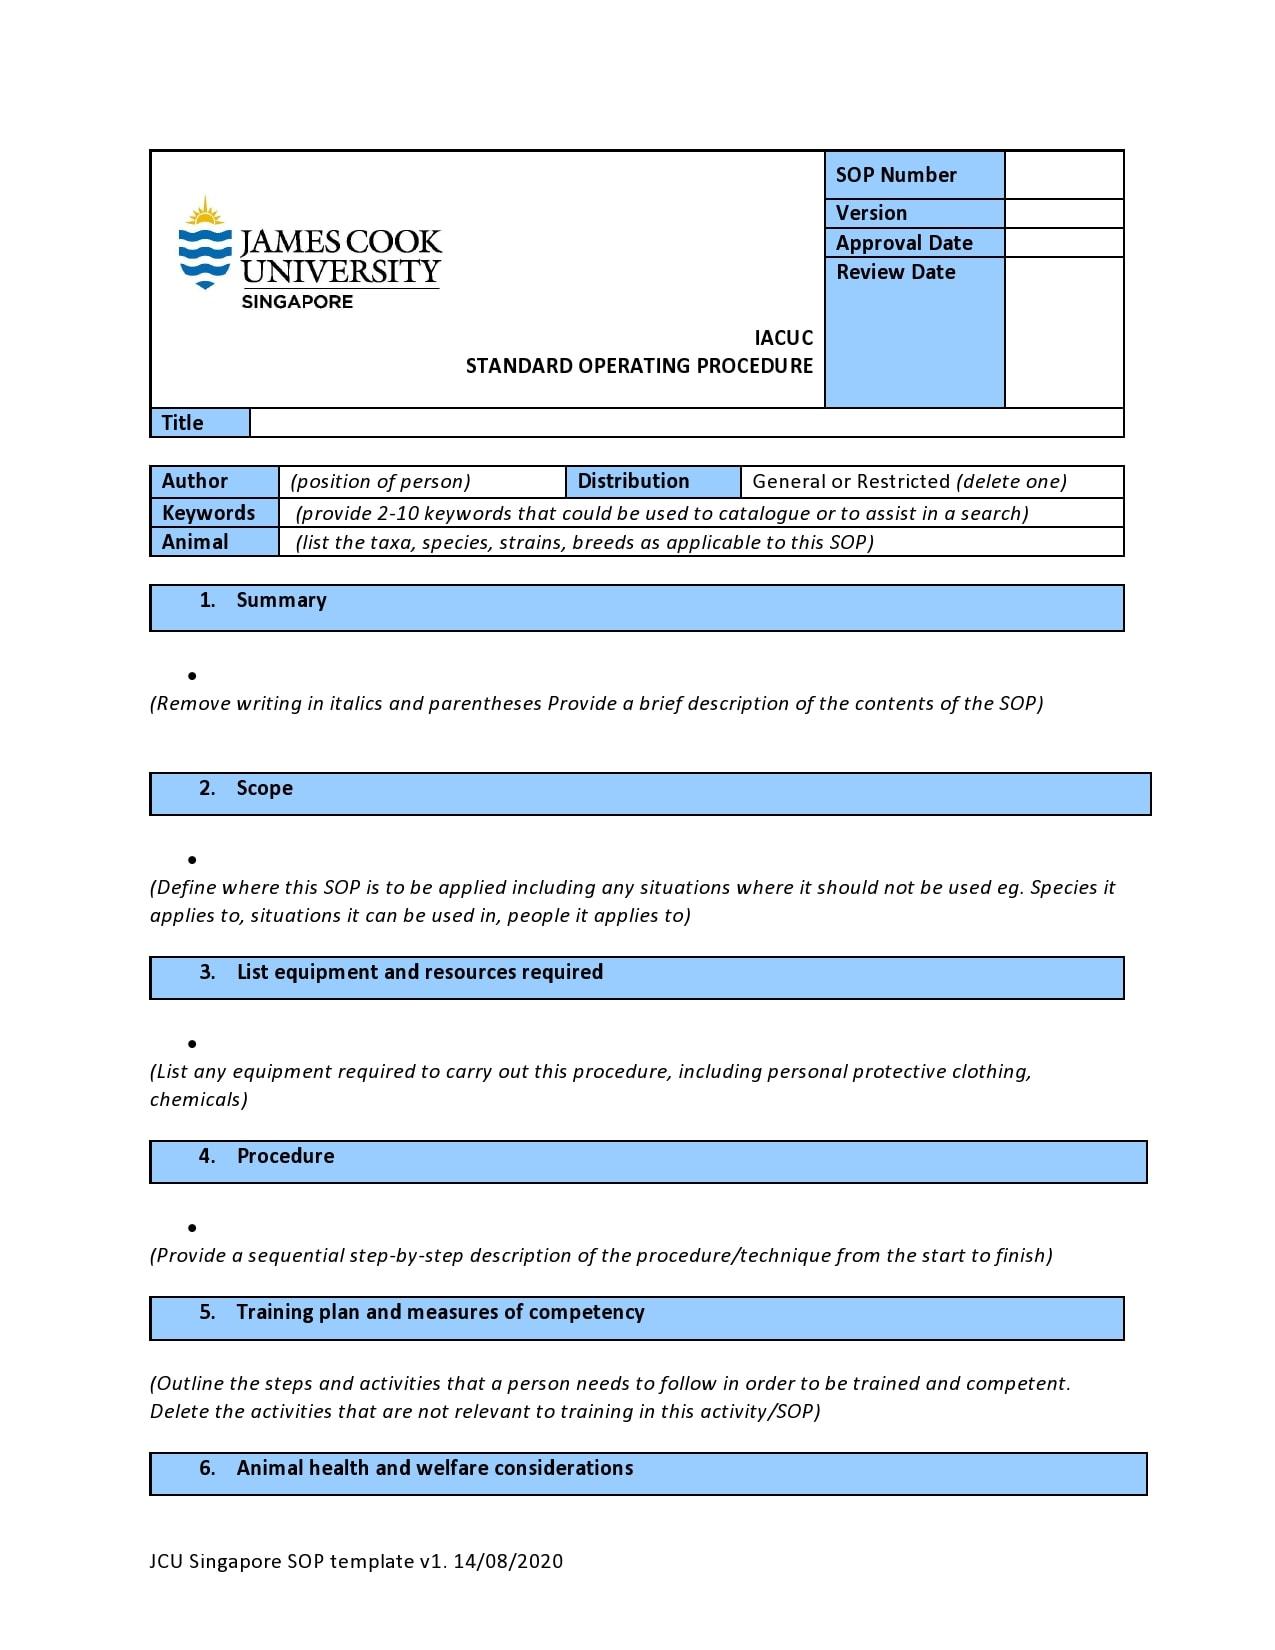 21 Free SOP Templates [Word] (Standard Operating Procedure) Within Procedure Manual Template Word Free